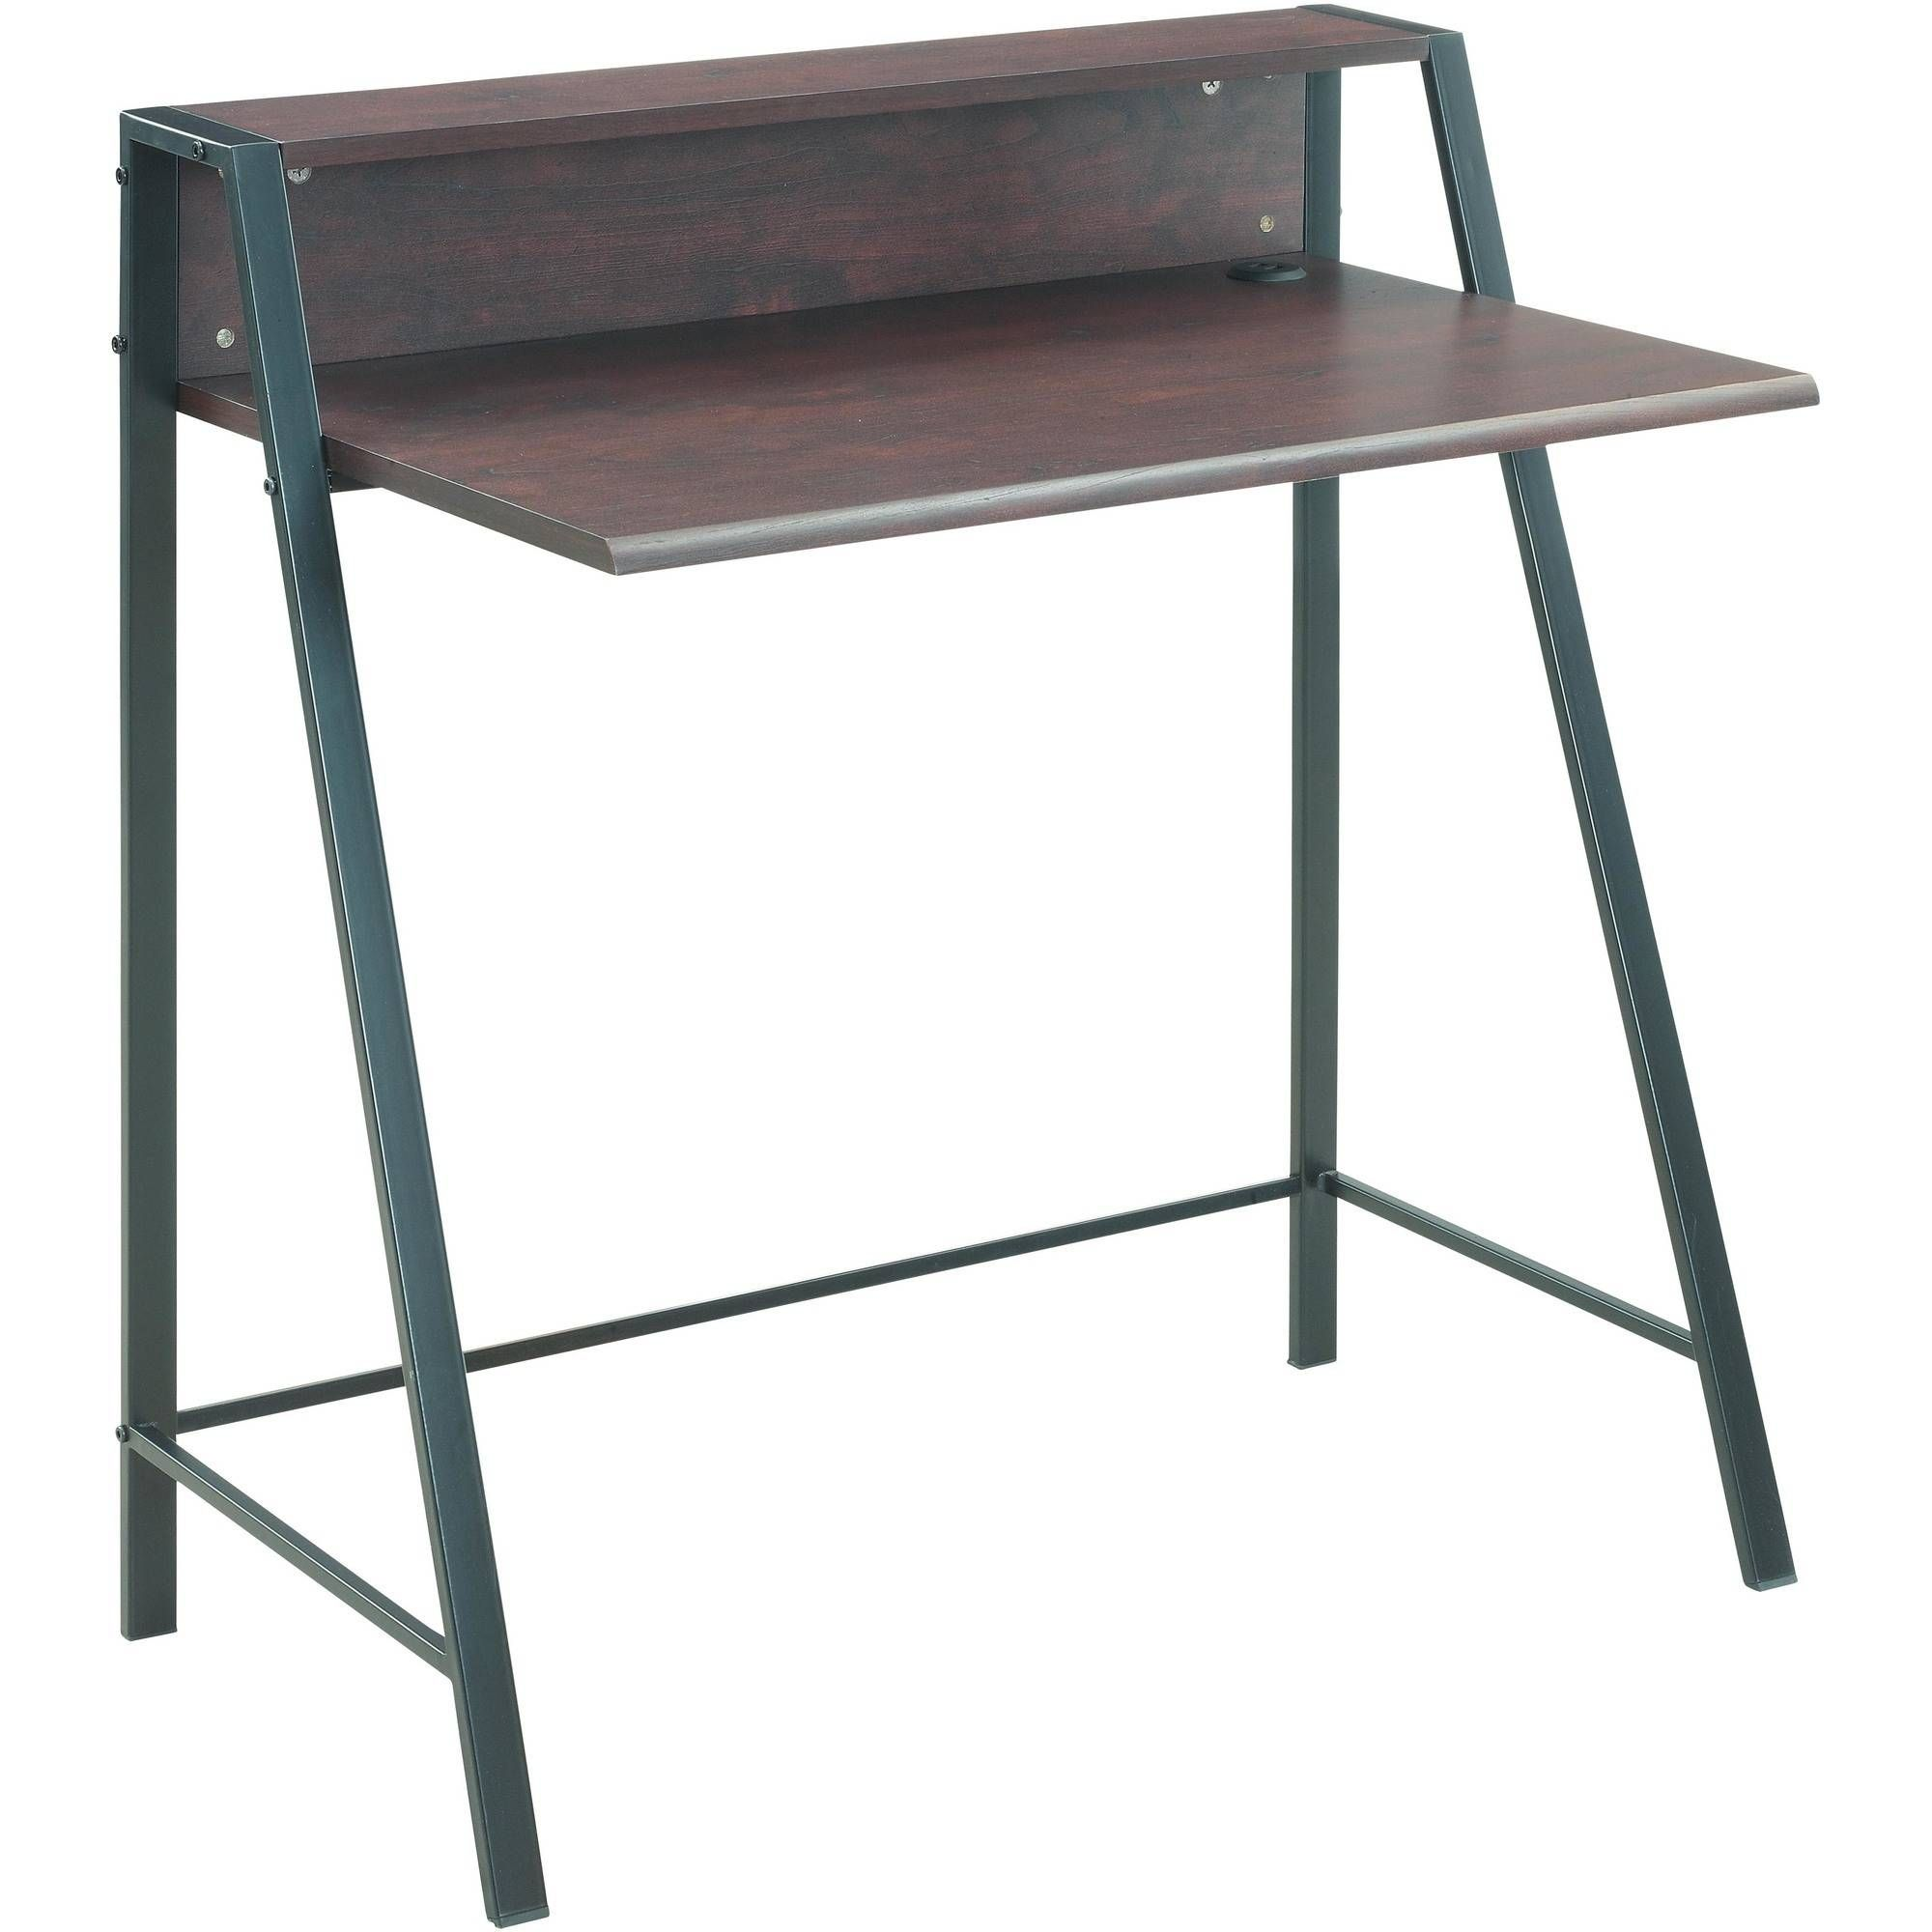 Mainstays Mid Century Writing Desk With Usb Charging Espresso Finish Walmart Com In 2020 Mid Century Writing Desk Writing Desk Corner Writing Desk